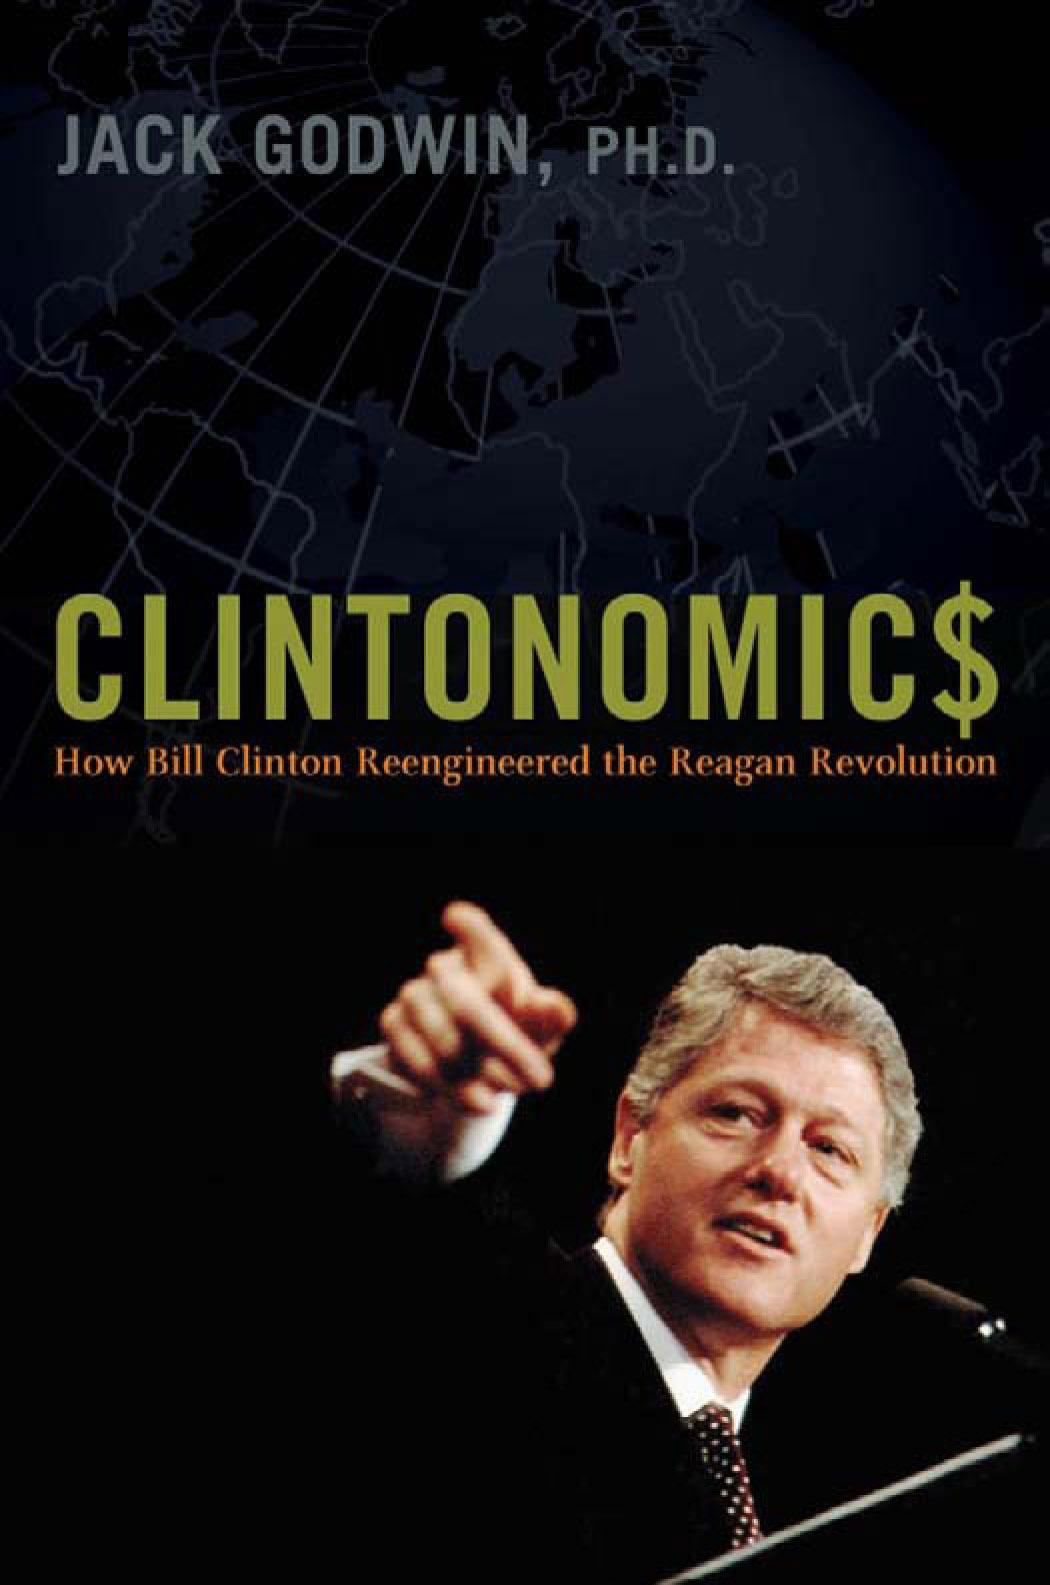 Clintonomics: How Bill Clinton Reengineered the Reagan Revolution EB9780814413999